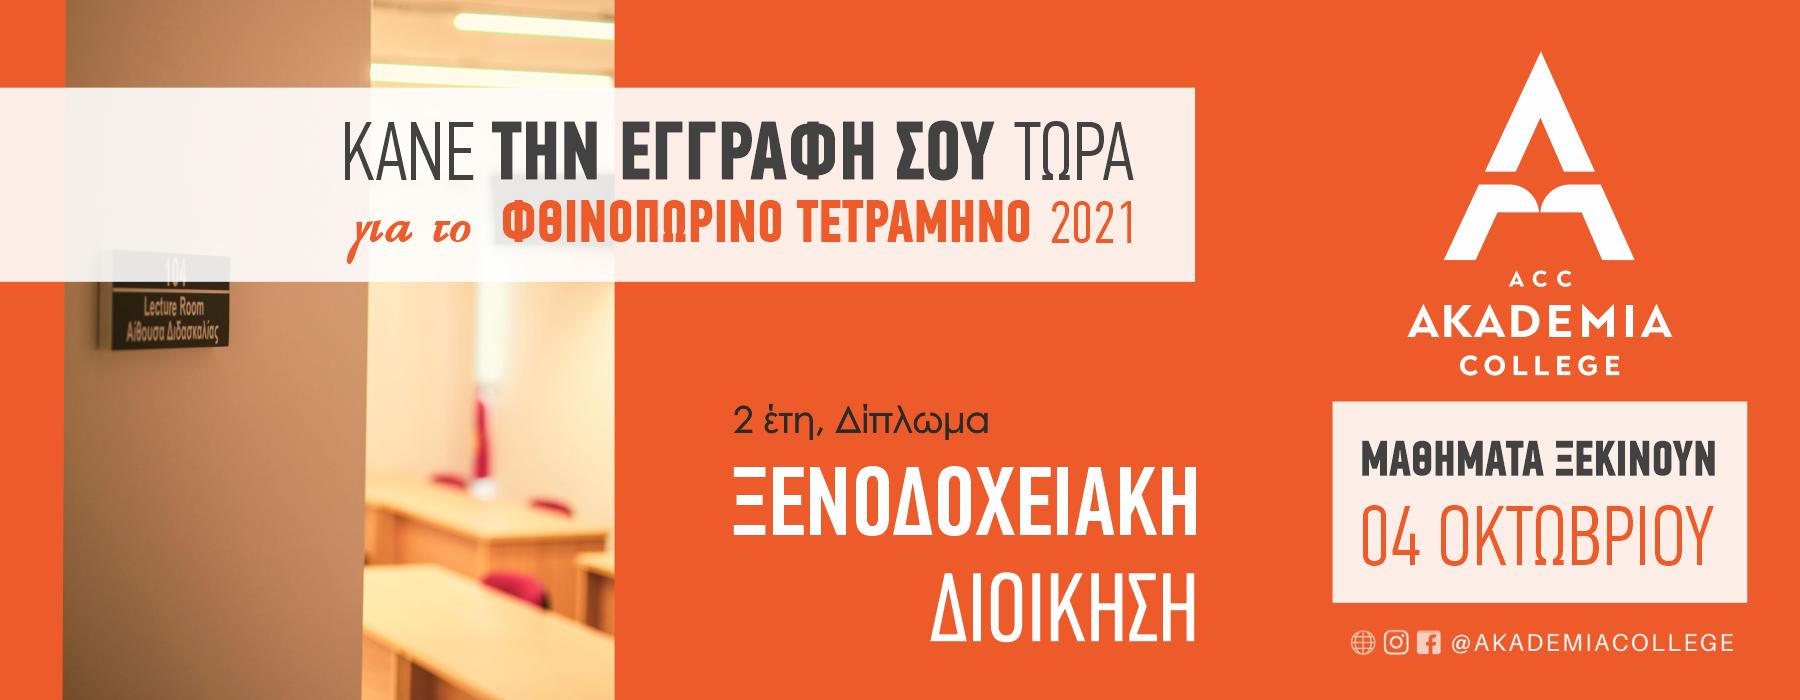 web-banner-fthinoporo-2021